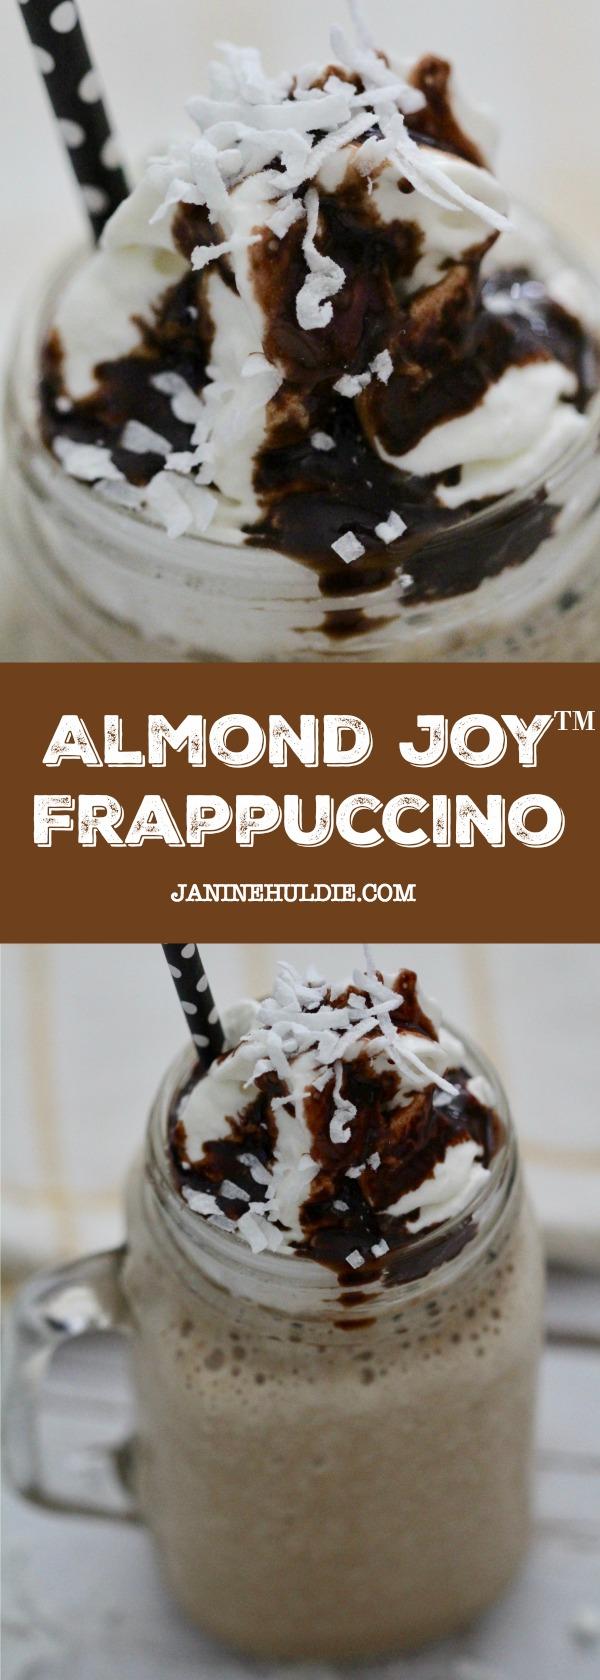 Almond Joy Frappuccino Recipe